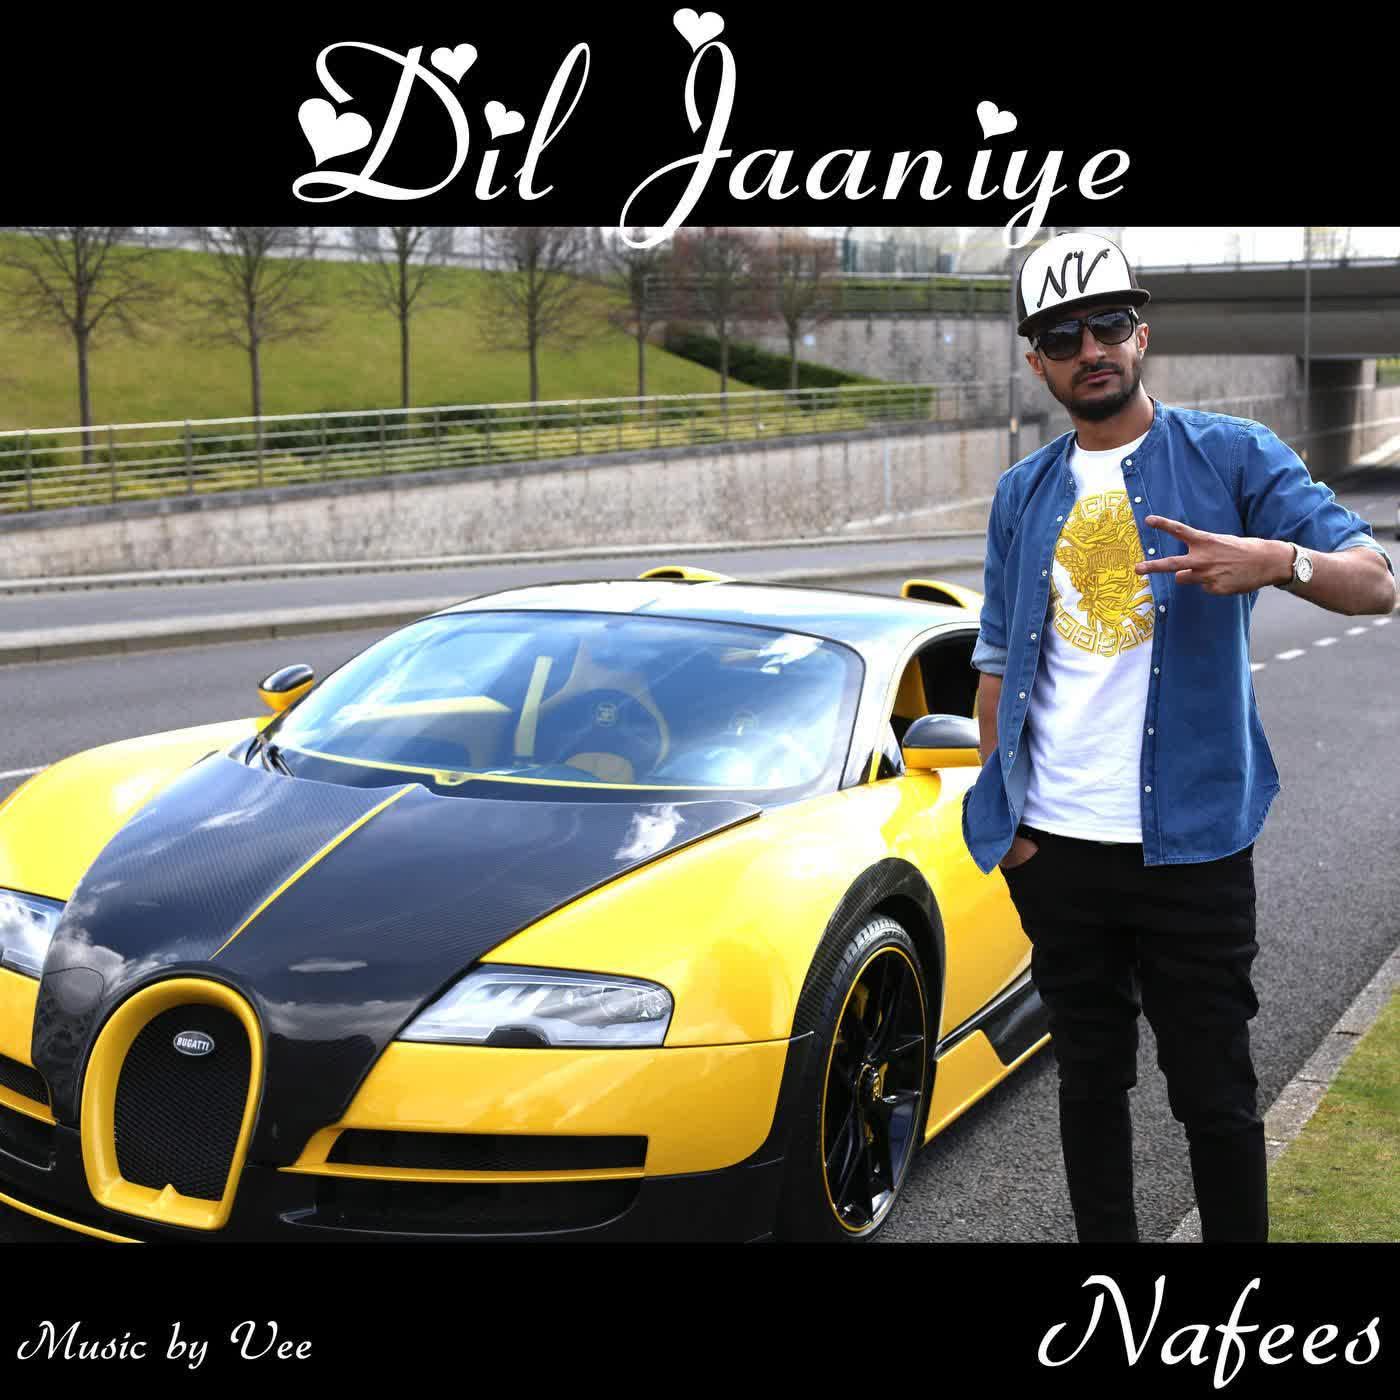 https://cover.djpunjab.org/37473/300x250/Dil_Jaaniye_Nafees.jpg